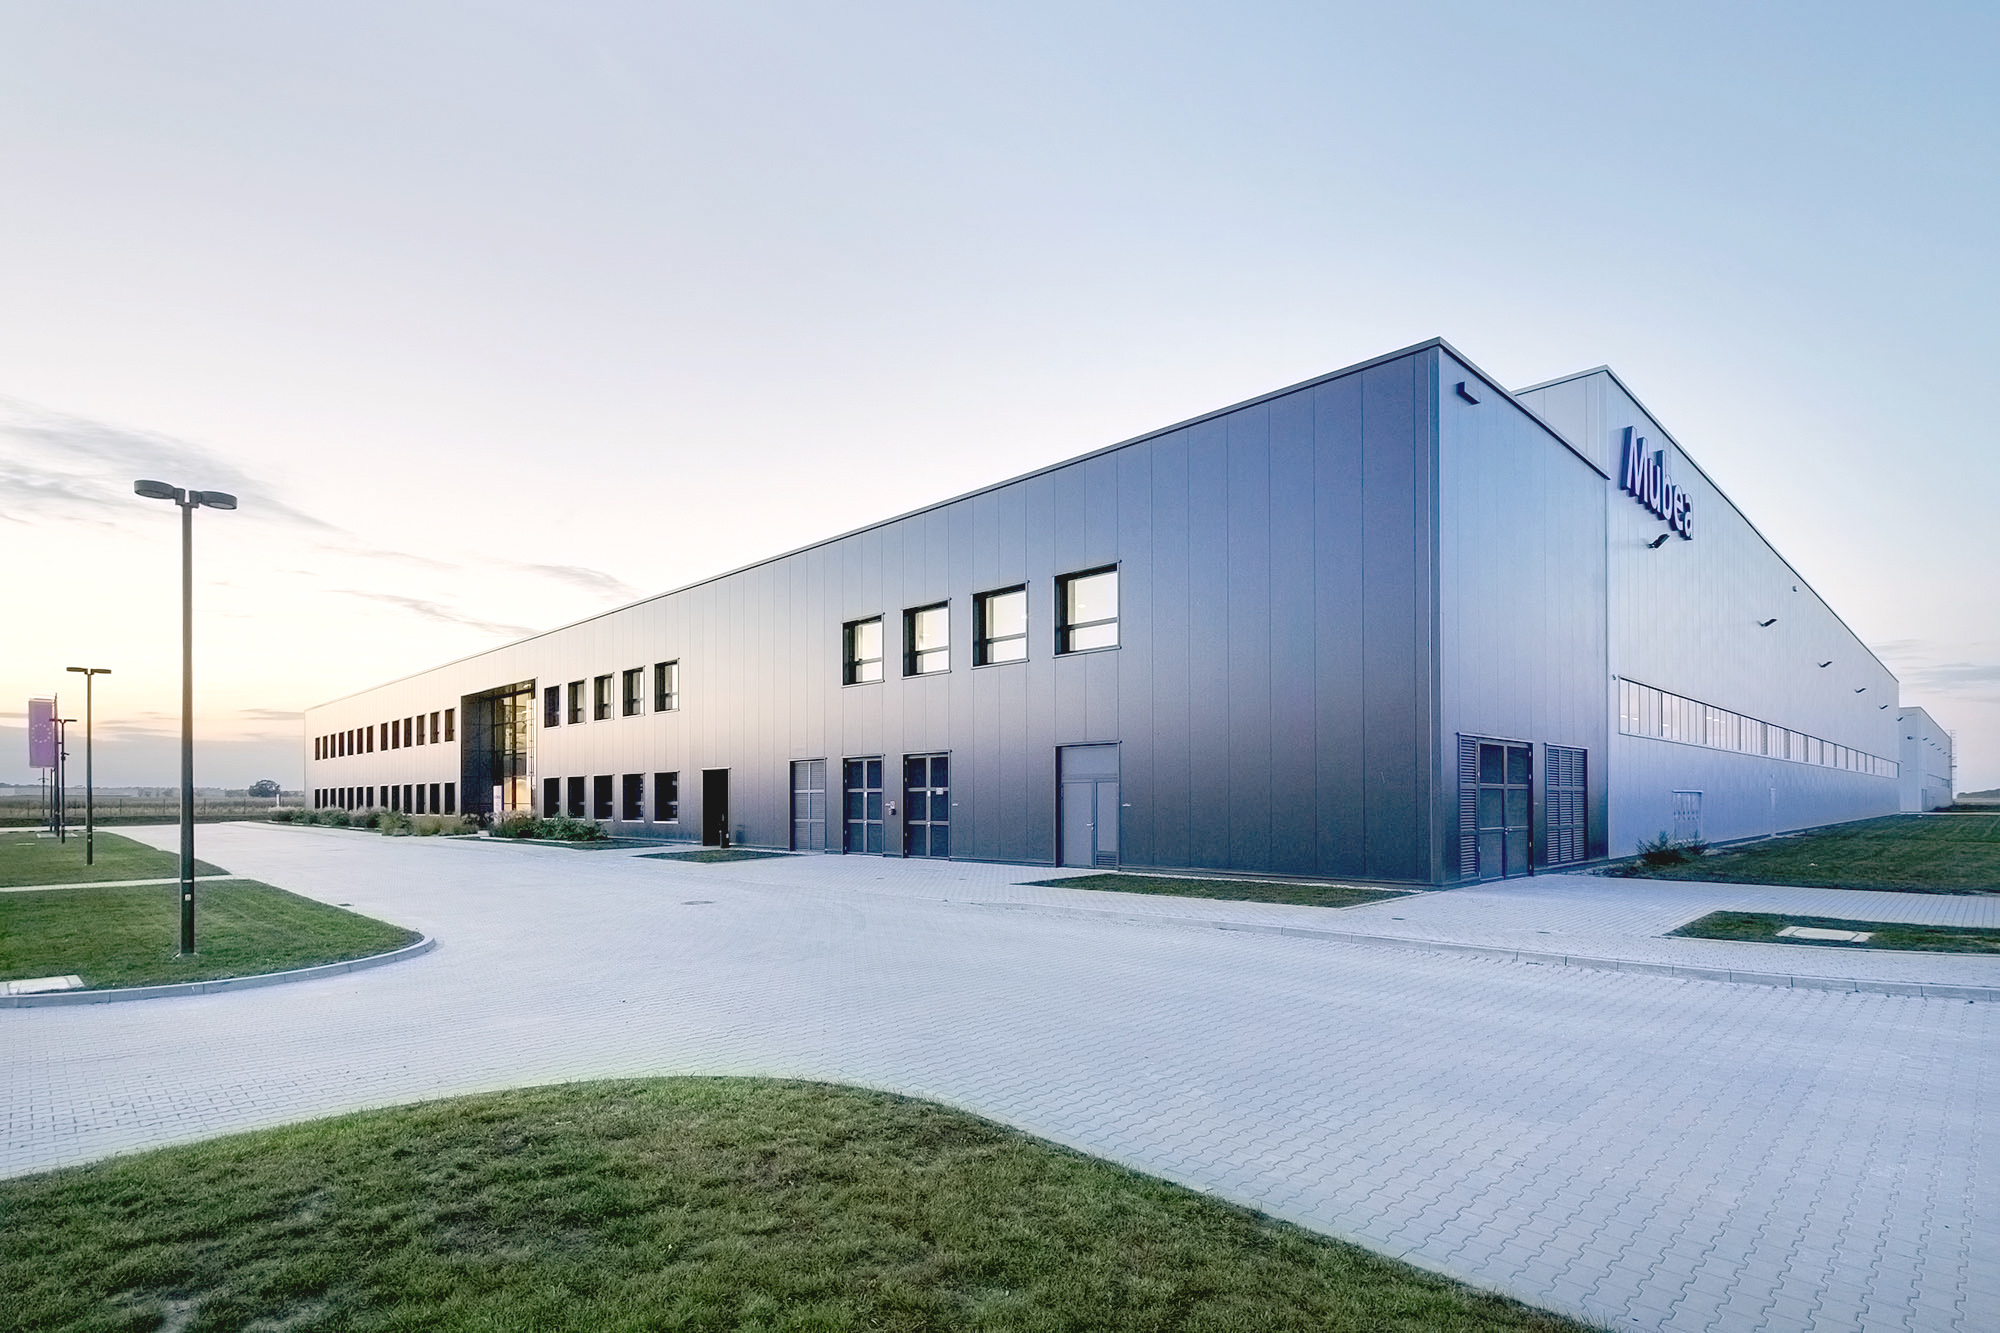 Mubea Automotive Factory in Ujazd Poland built by Takenaka Europe